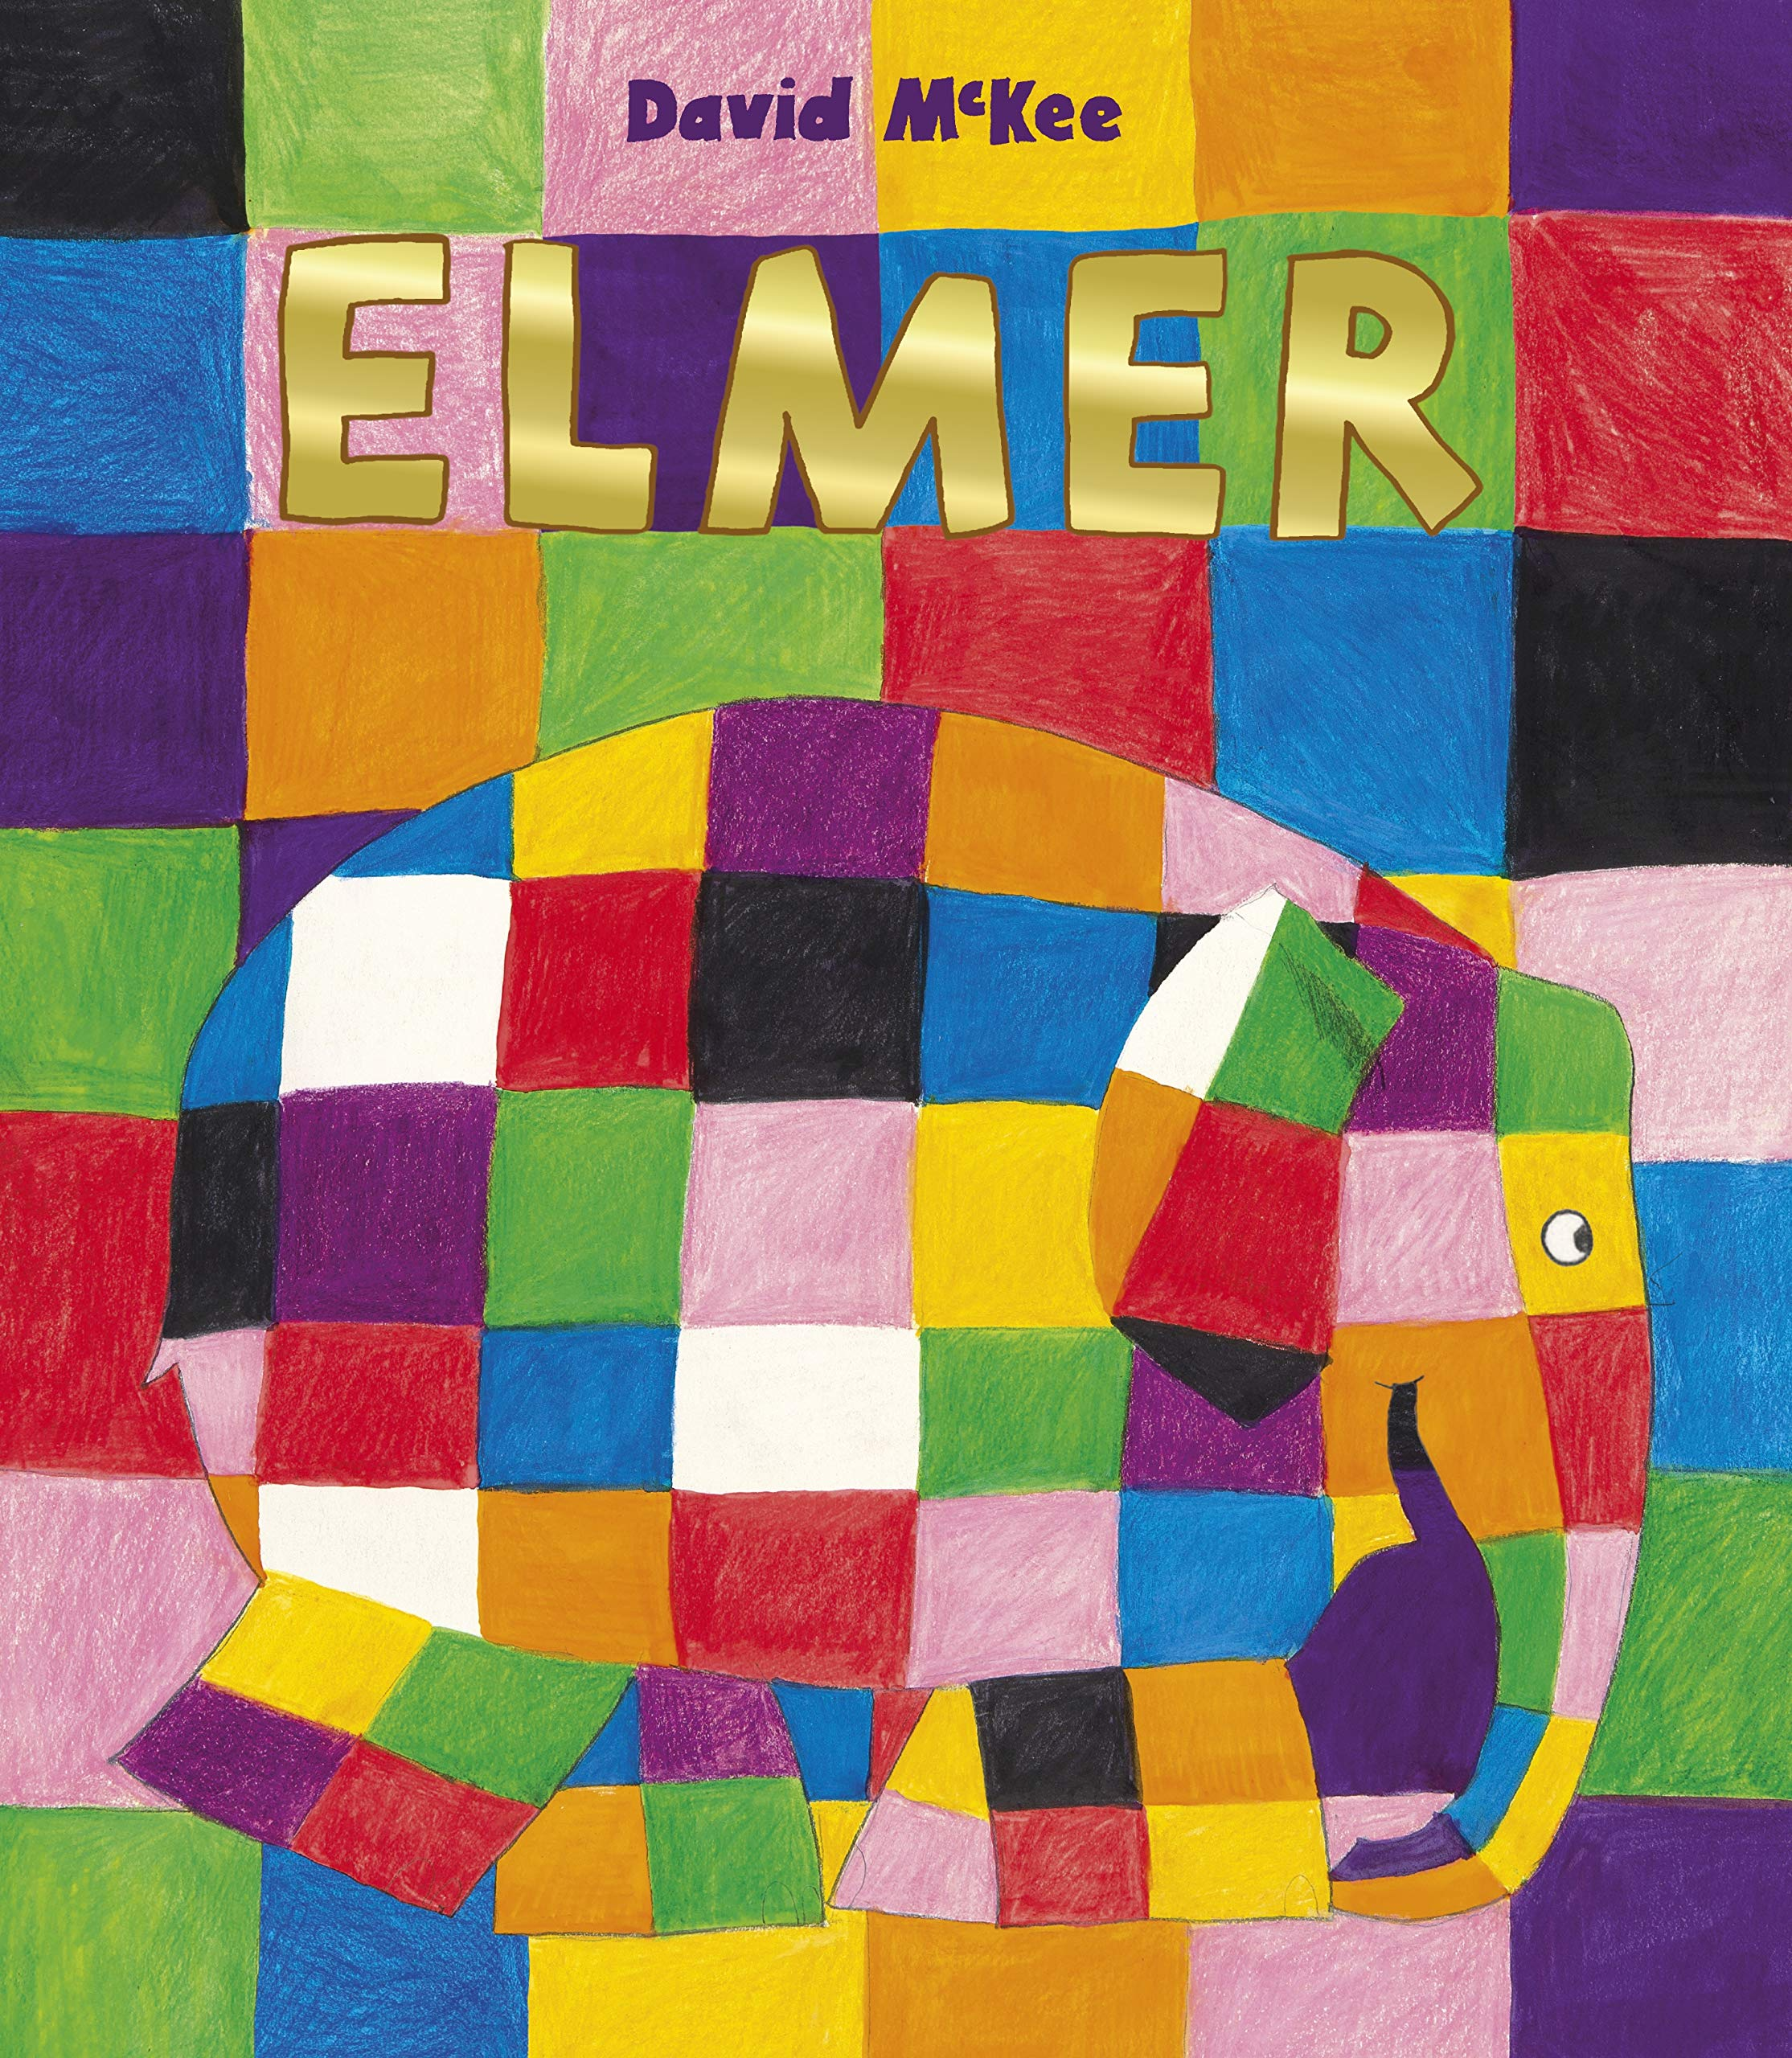 Elmer: 30th Anniversary Edition: 1 (Elmer Picture Books): Amazon.co.uk: McKee, David: 9781842707319: Books